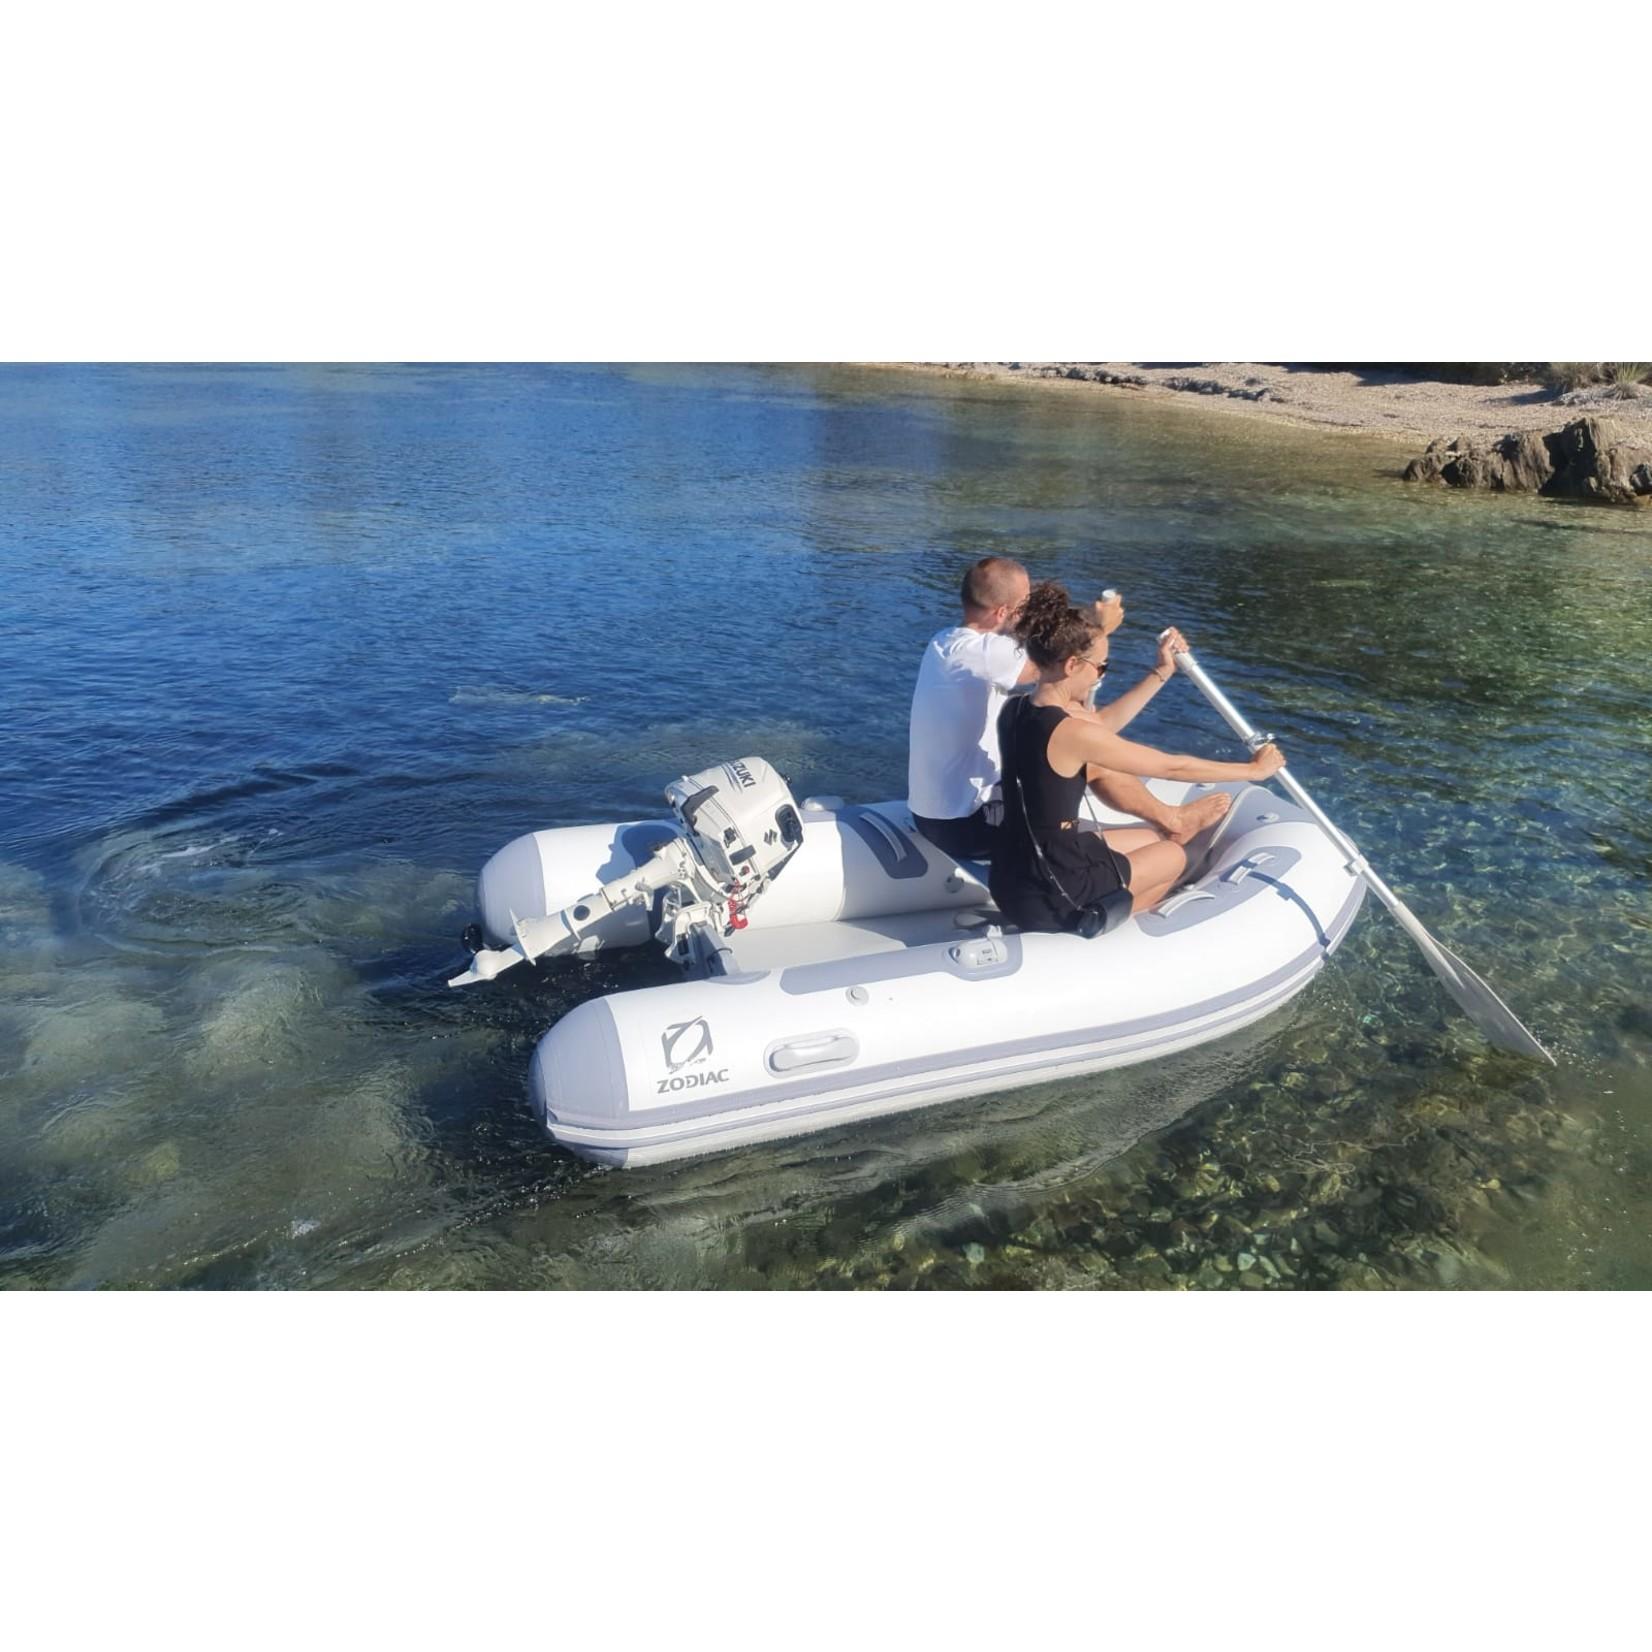 Zodiac Zodiac Cadet 270 AERO - inflatable airfloor